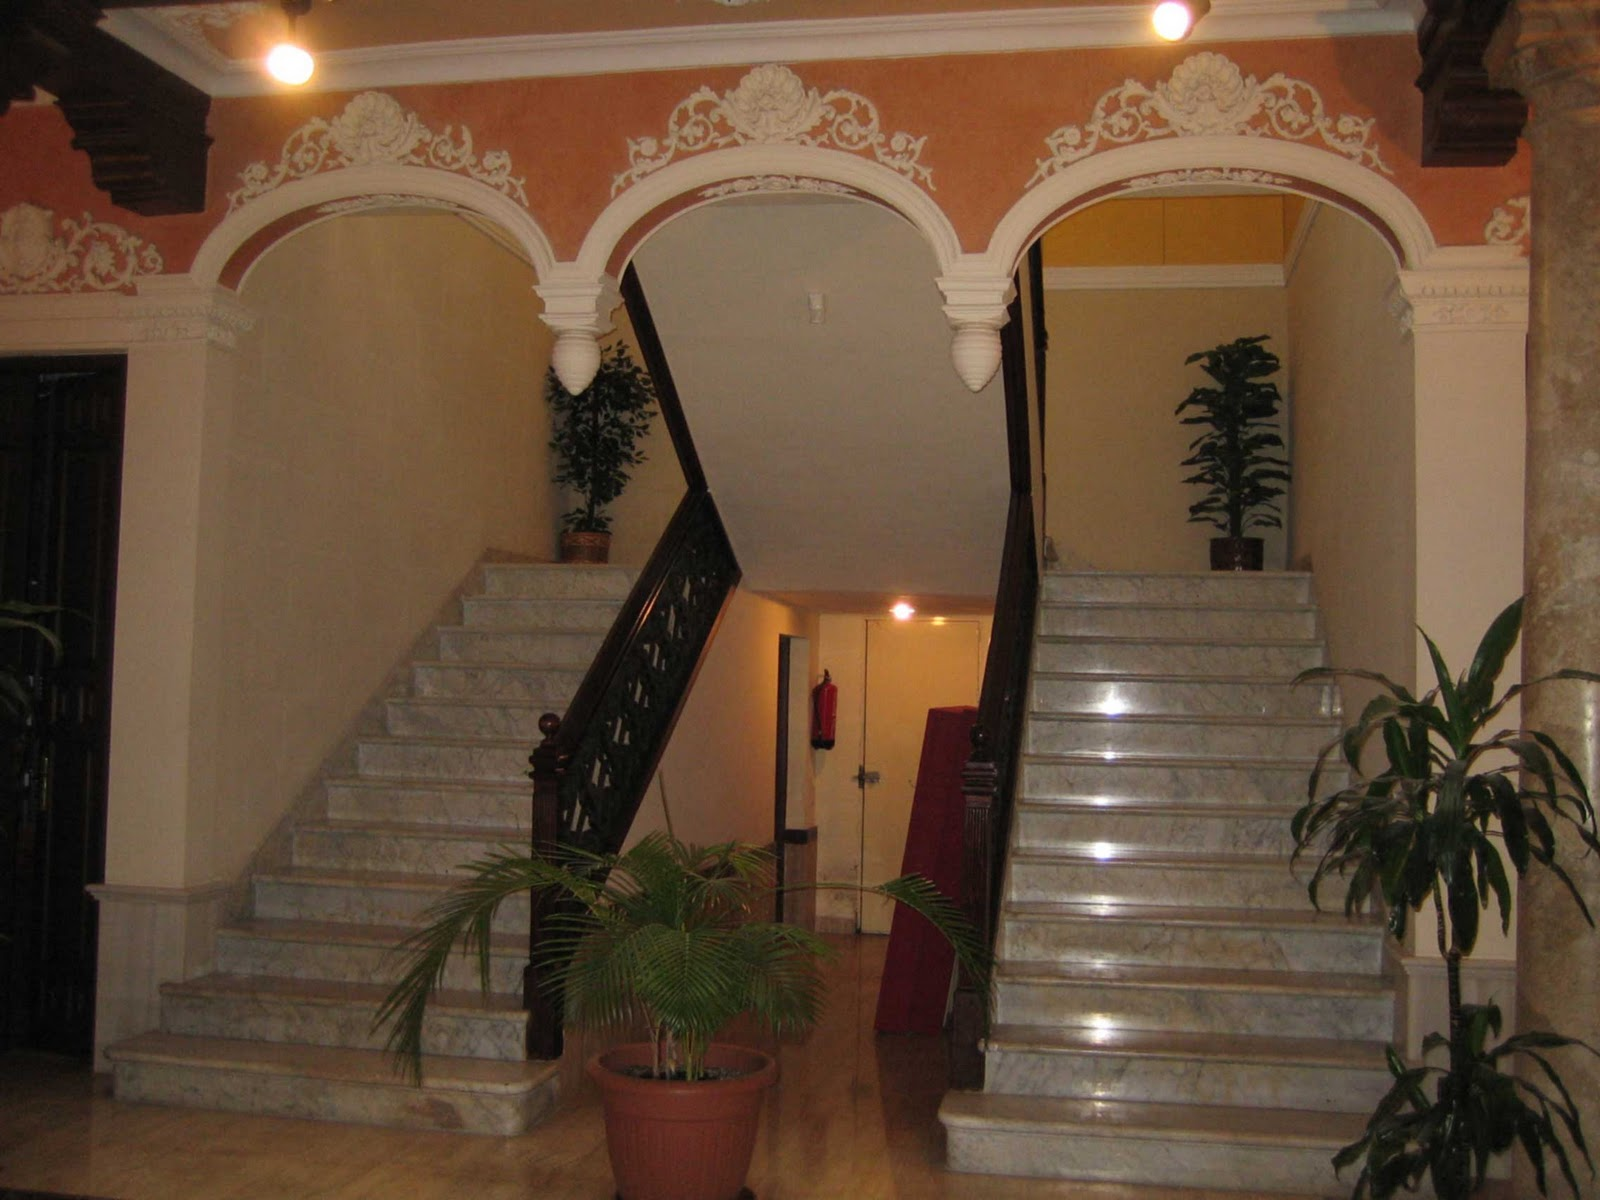 Paseando con inda for Escalera caracol 2 pisos